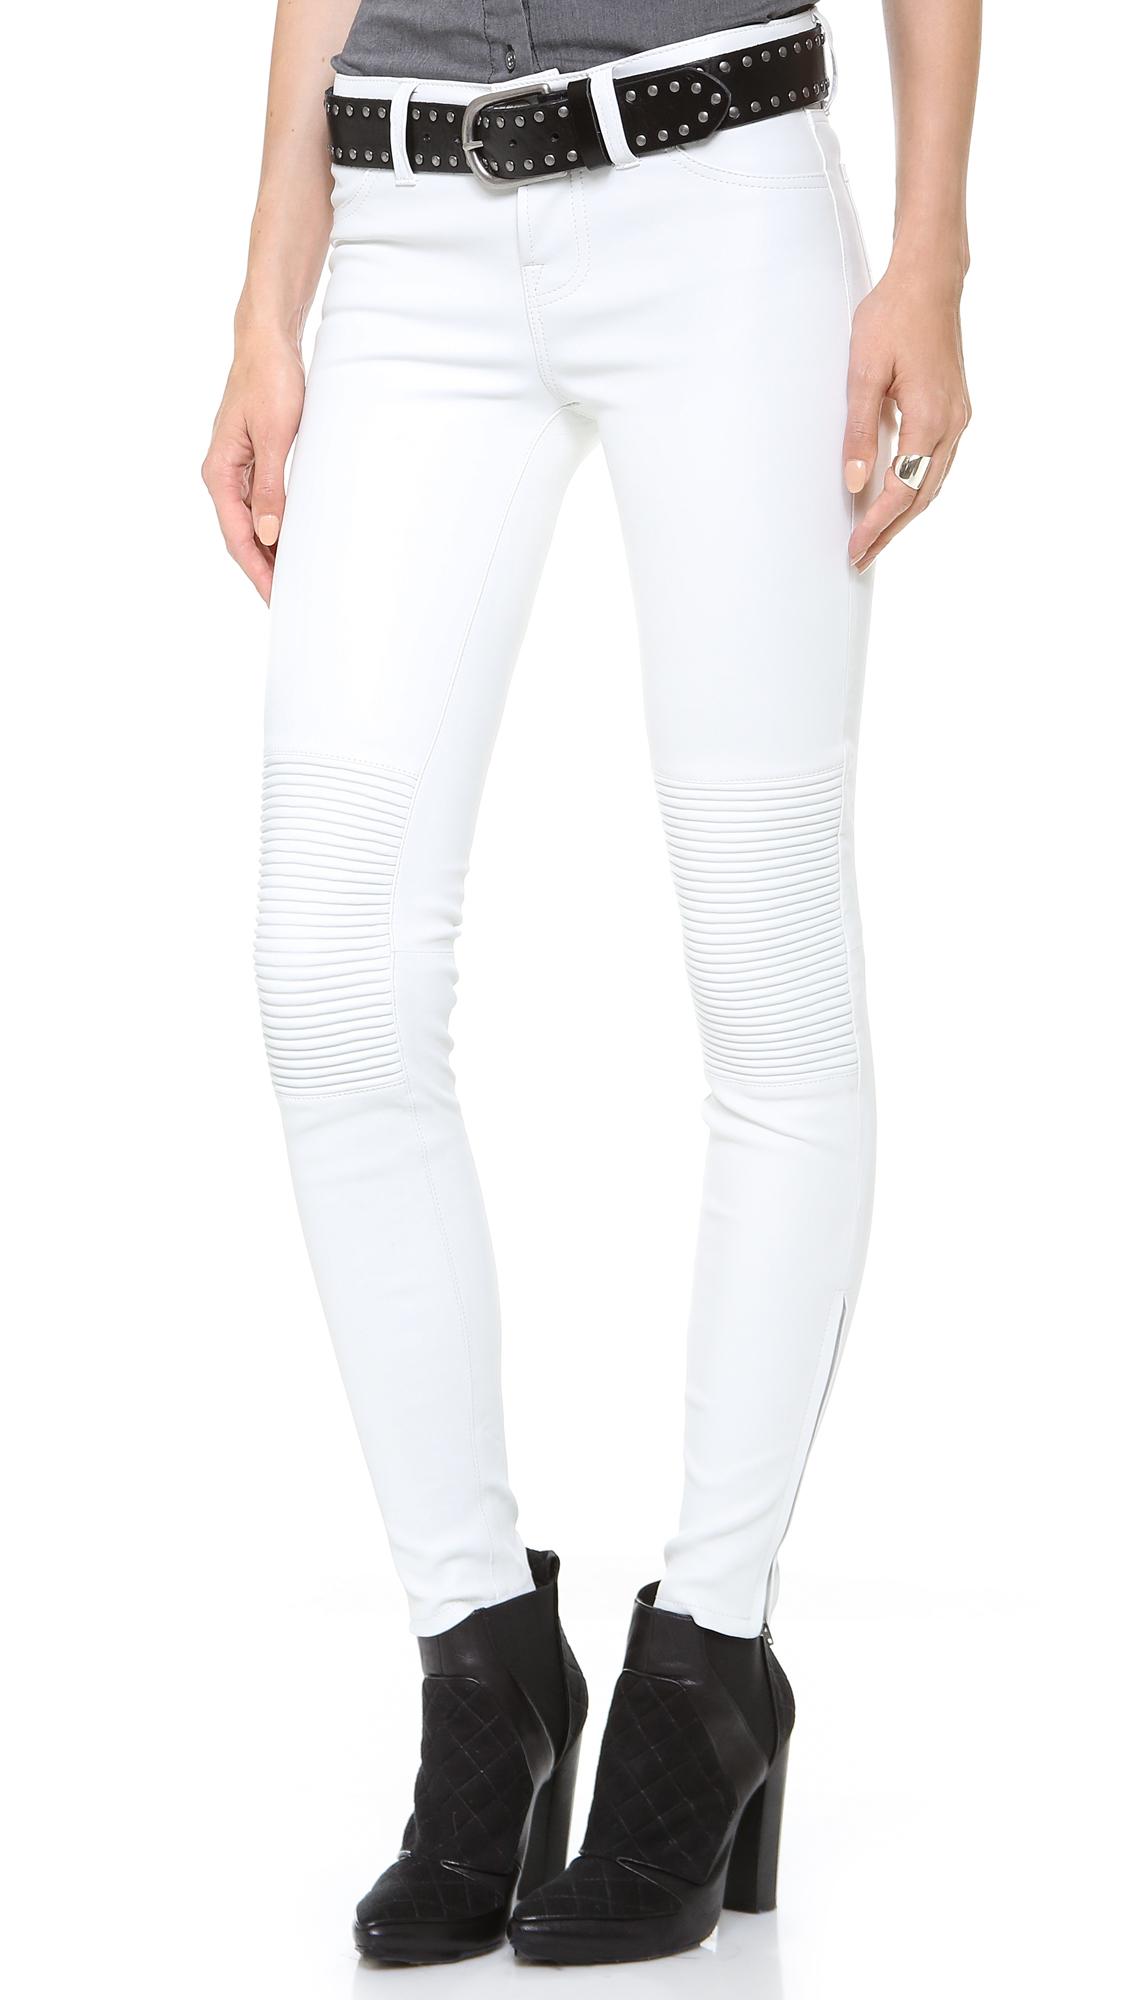 Popular REV39IT Xena Women39s Leather Pants  BlackWhite